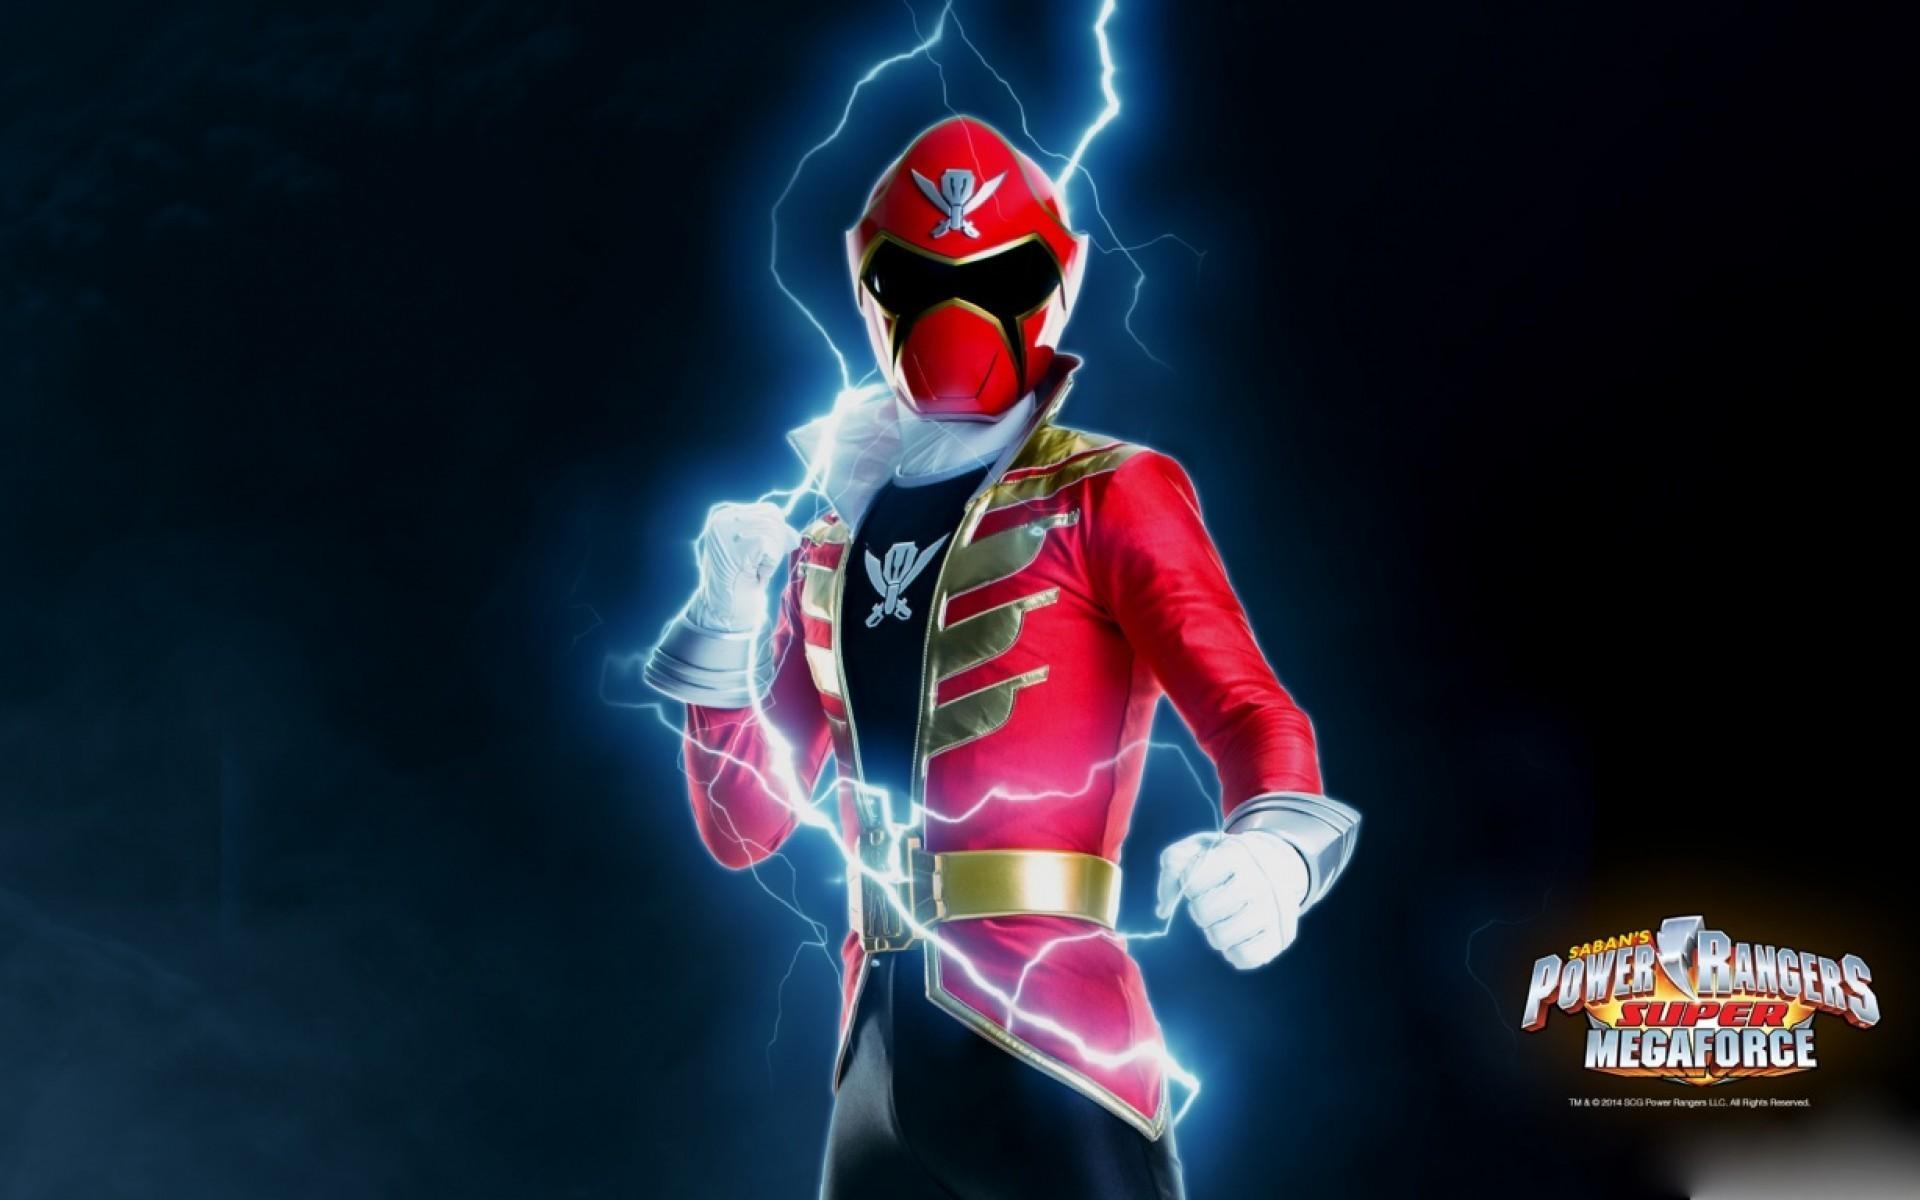 Power Rangers Super Megaforce 2014 Wallpaper – New HD Wallpapers